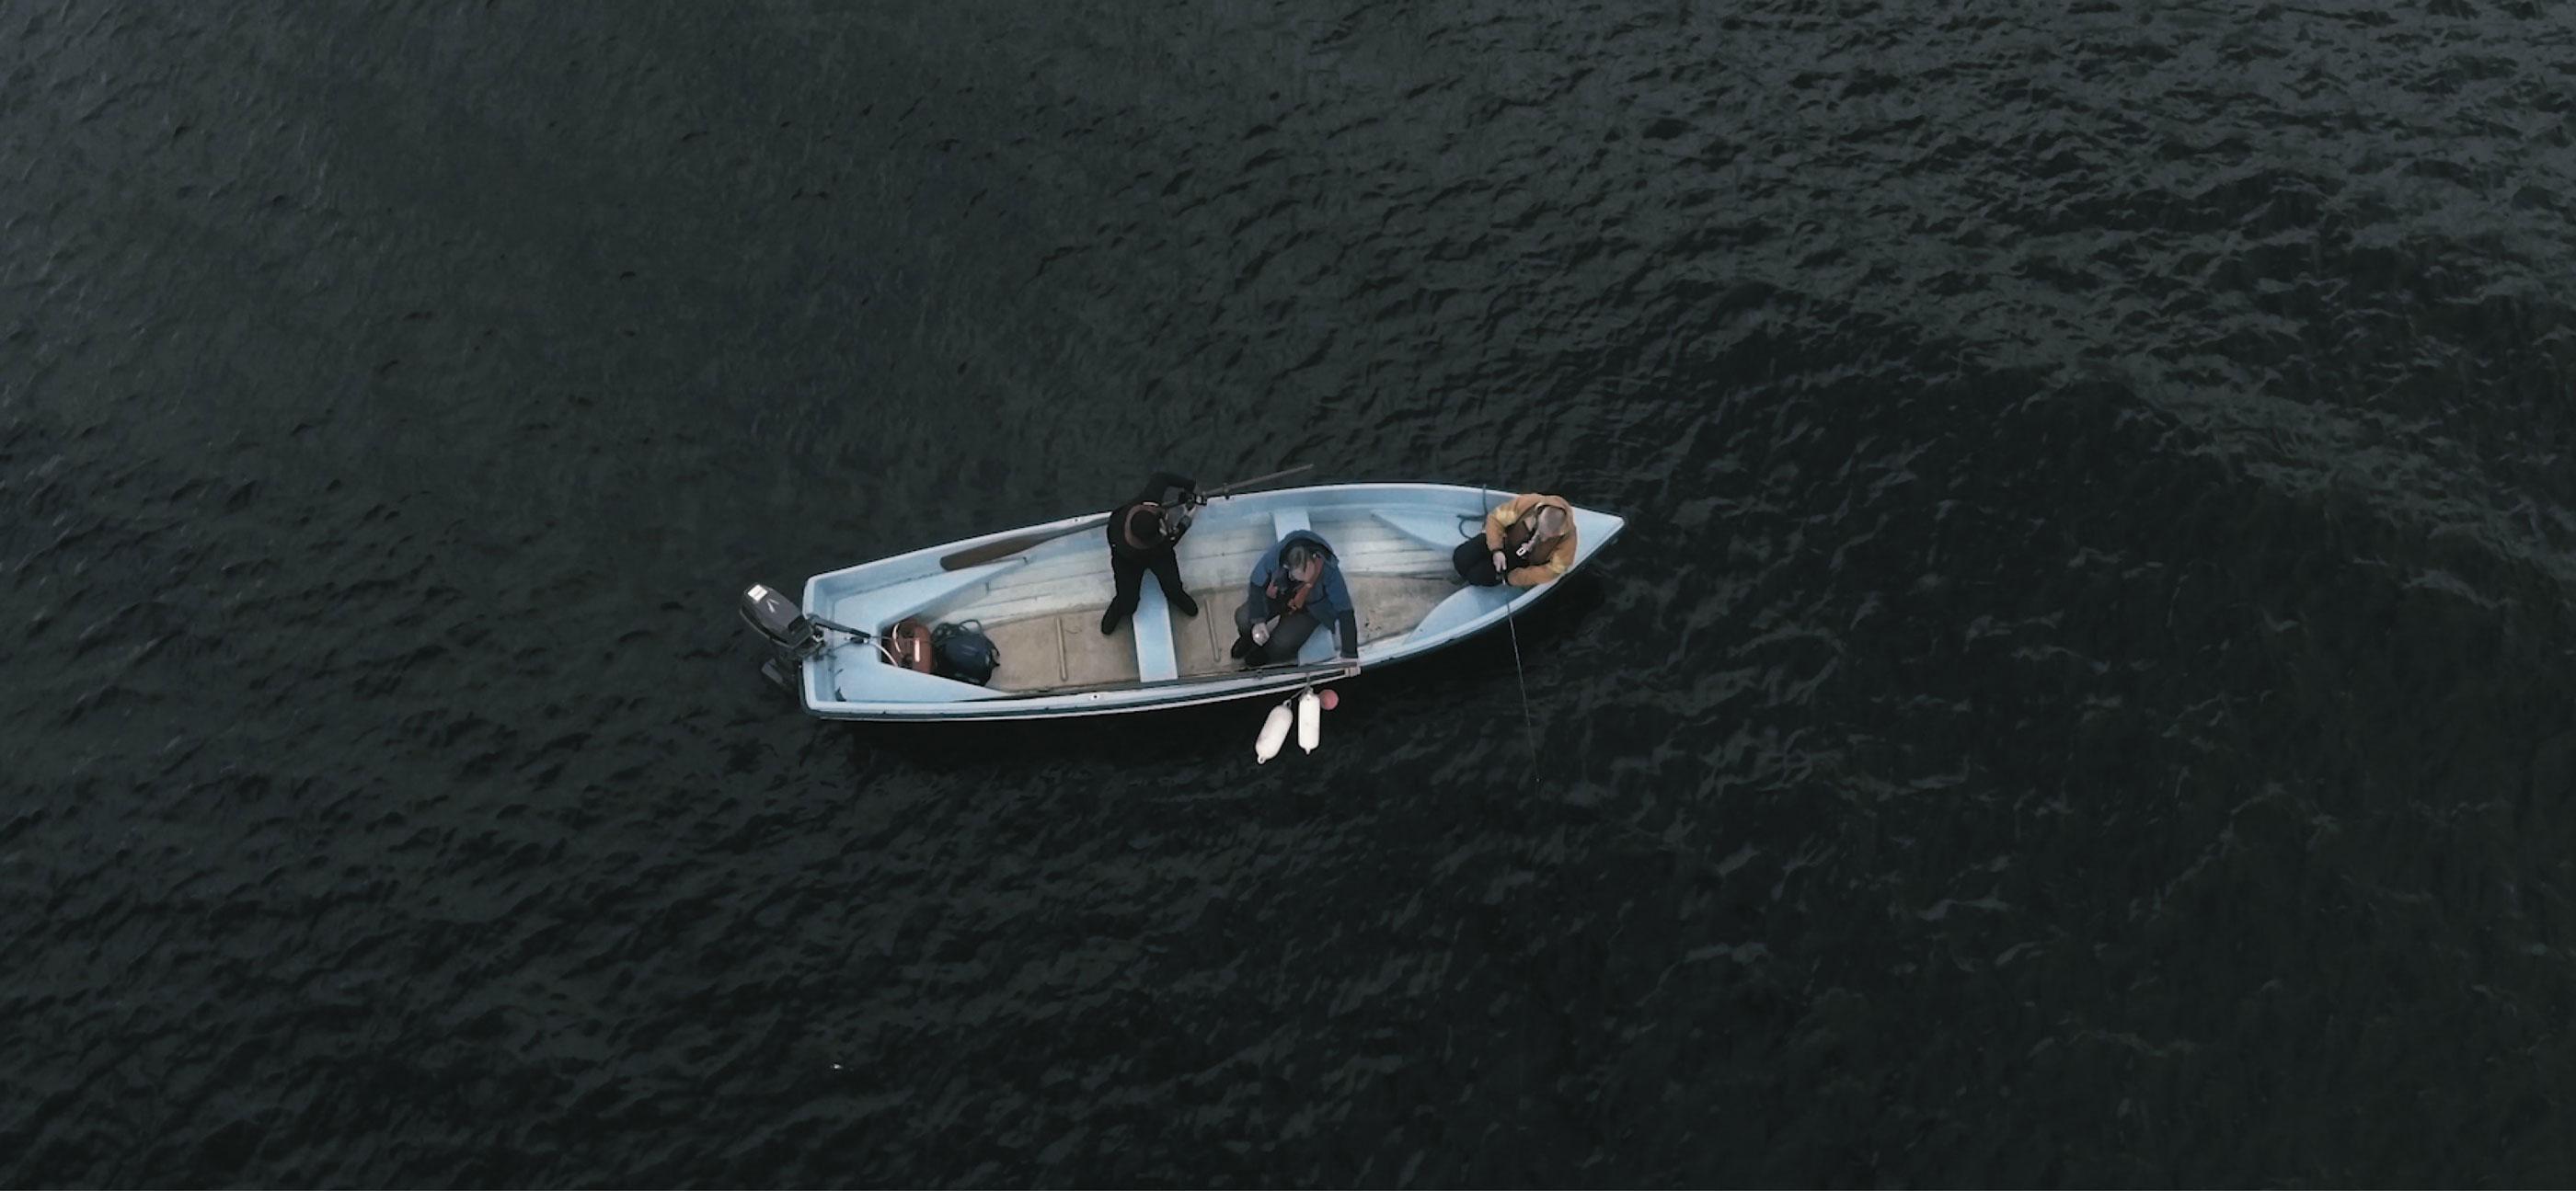 Novas video & photography production. Joe & Joe Go Fishing. Three men in a boat.